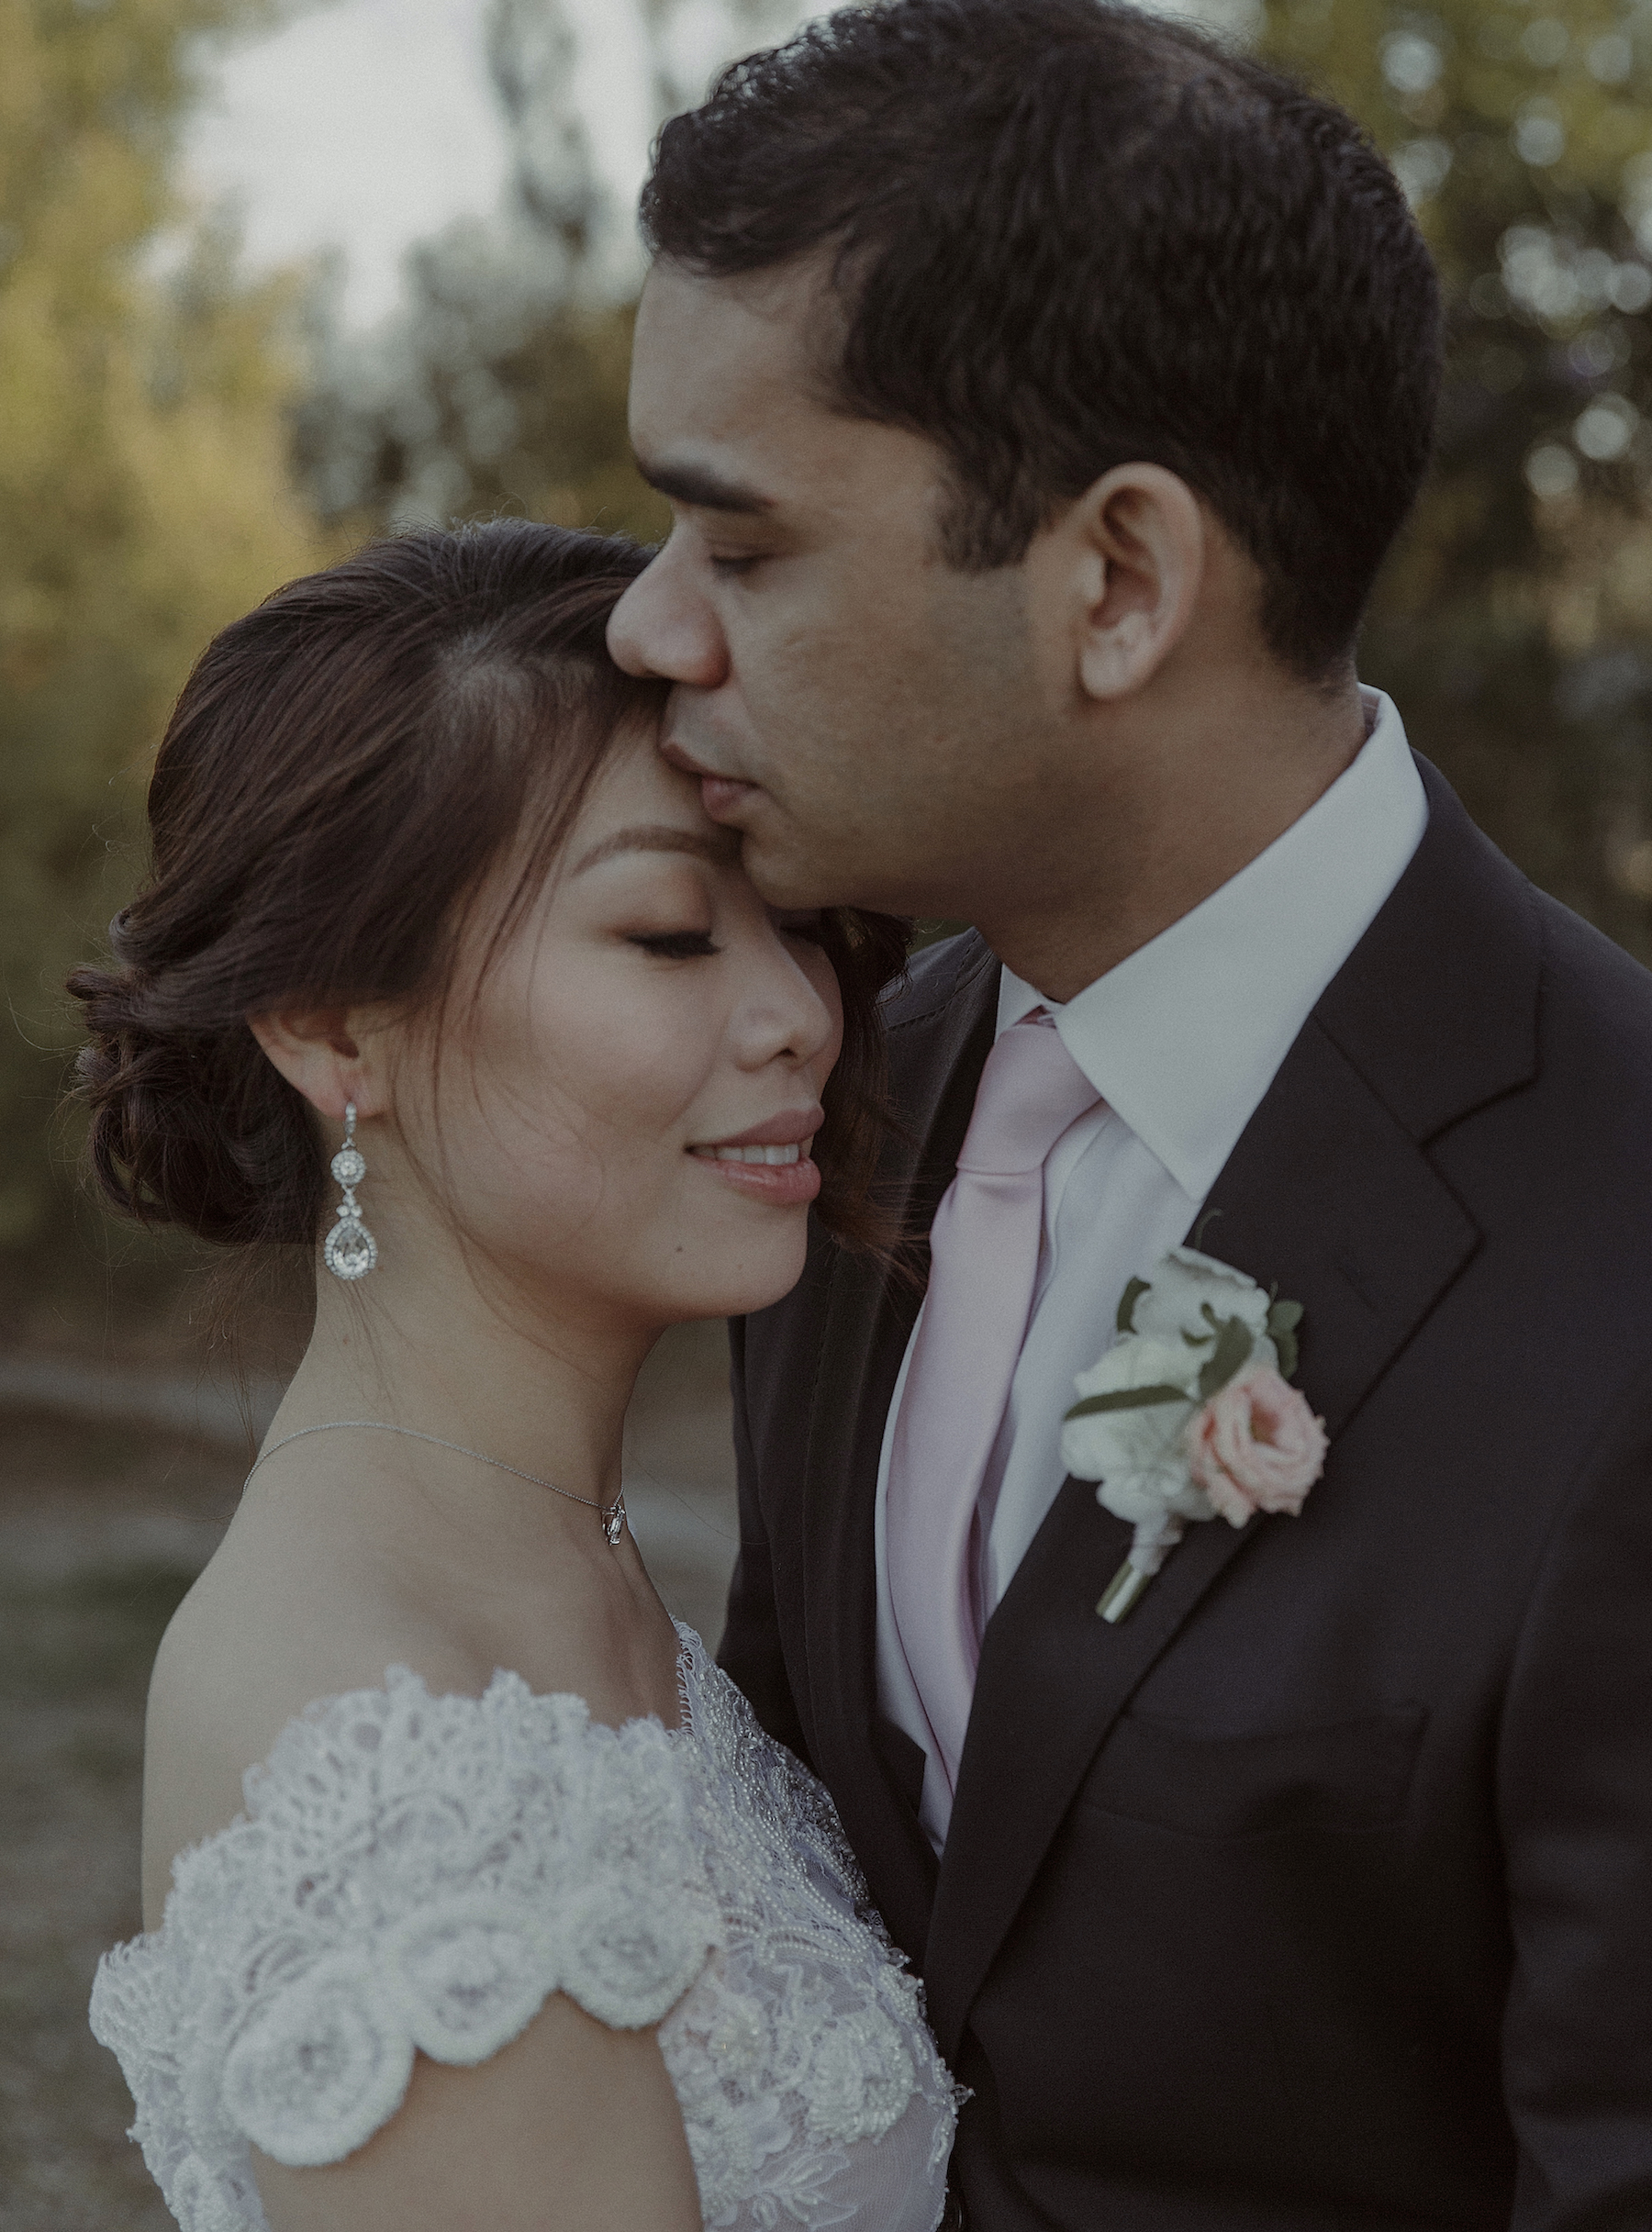 barr-mansion-wedding-austin-texas8874.JPG